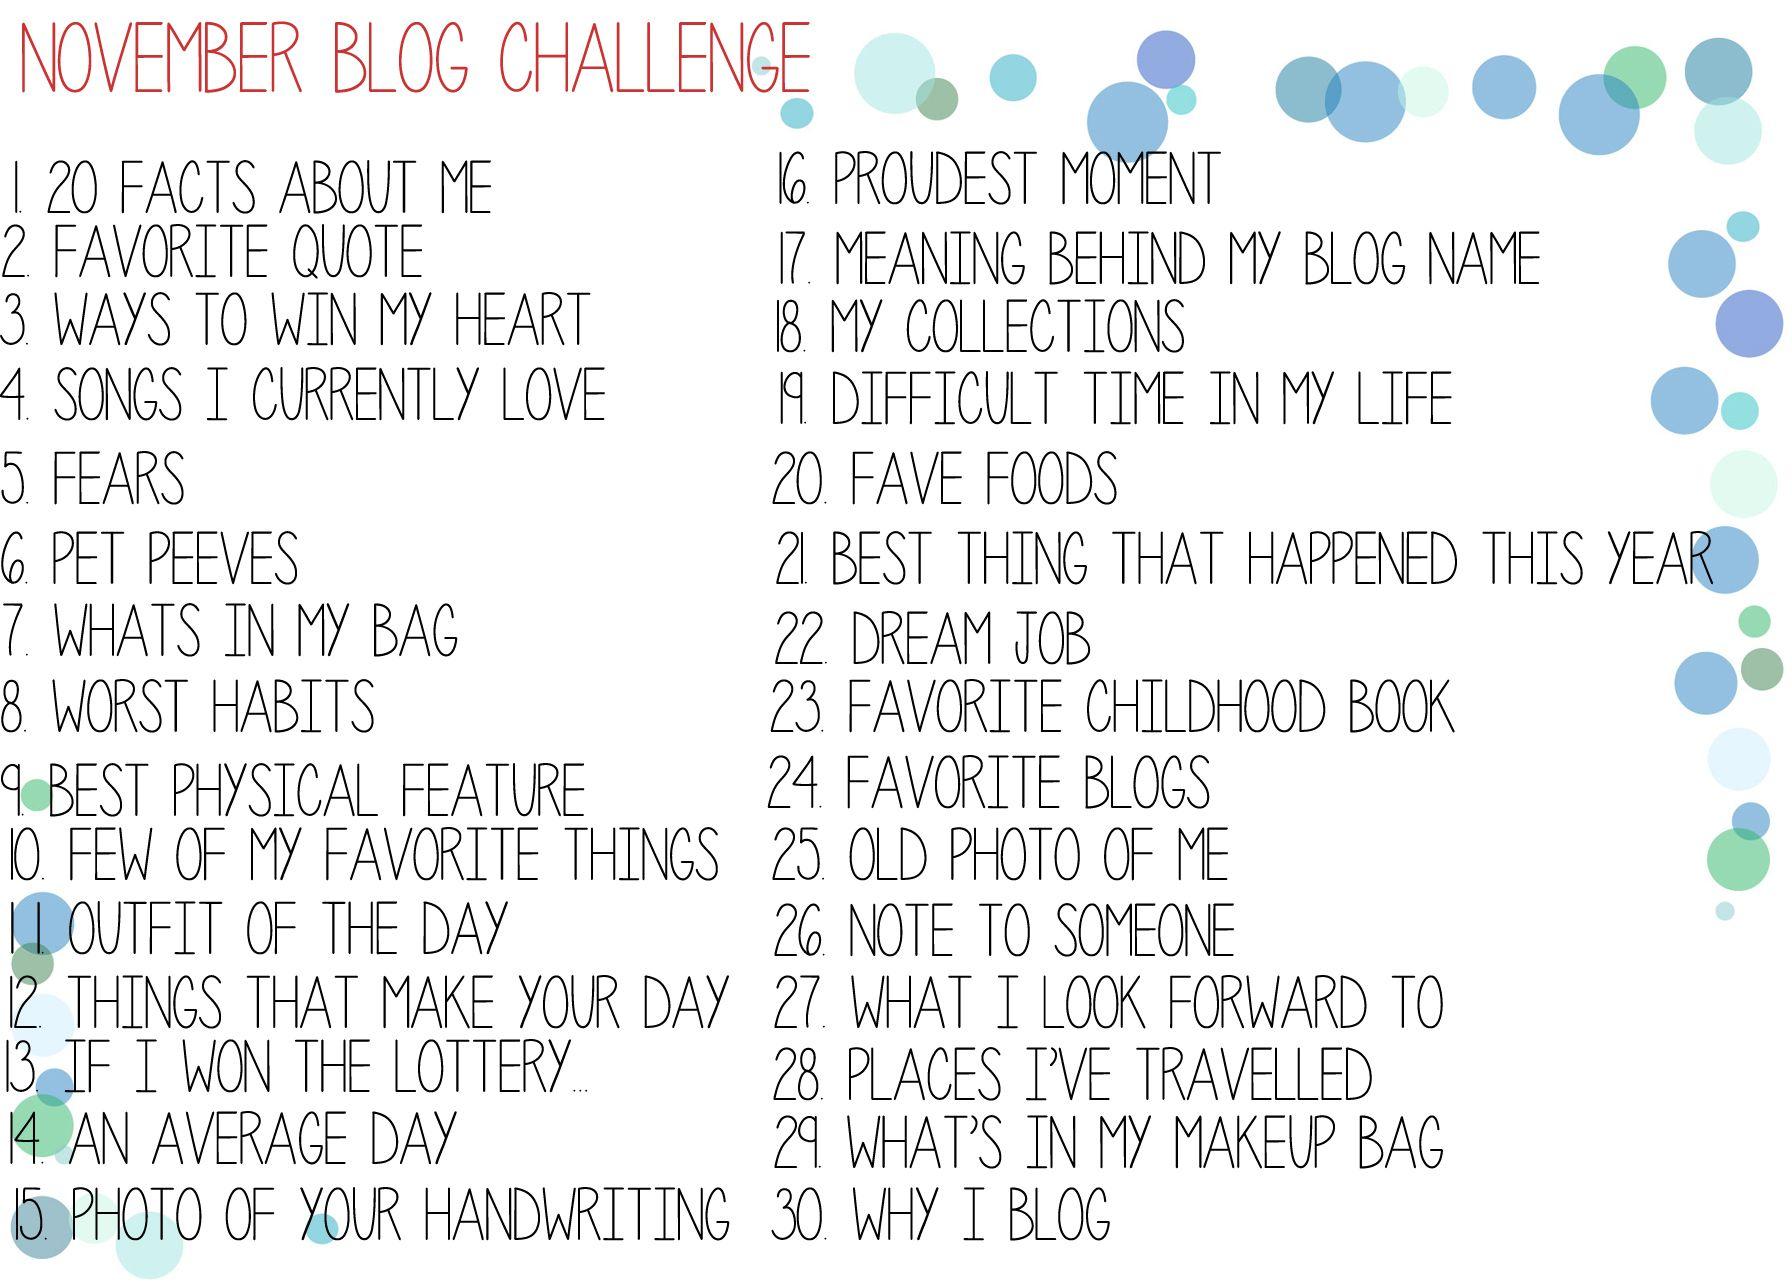 30 Day Blog Challenge Topics The 30 Day Blog Challenge